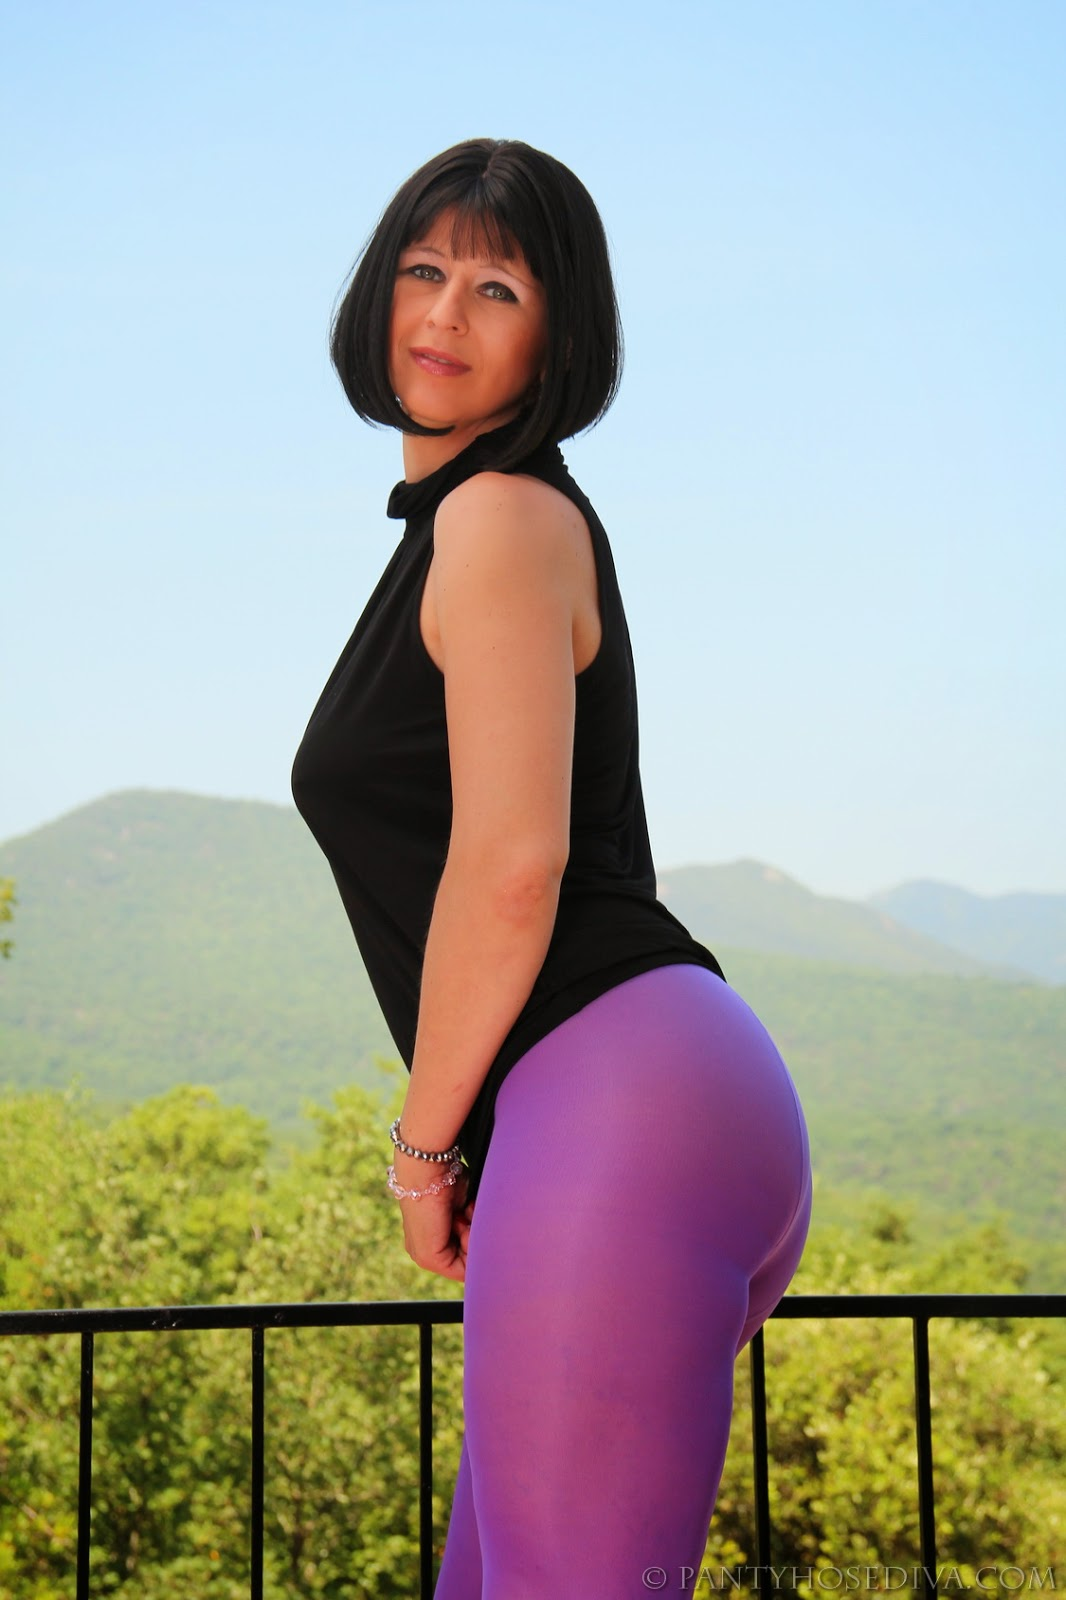 Wearing Pantyhose Pics Pics Opaque - Anal Sex Movies